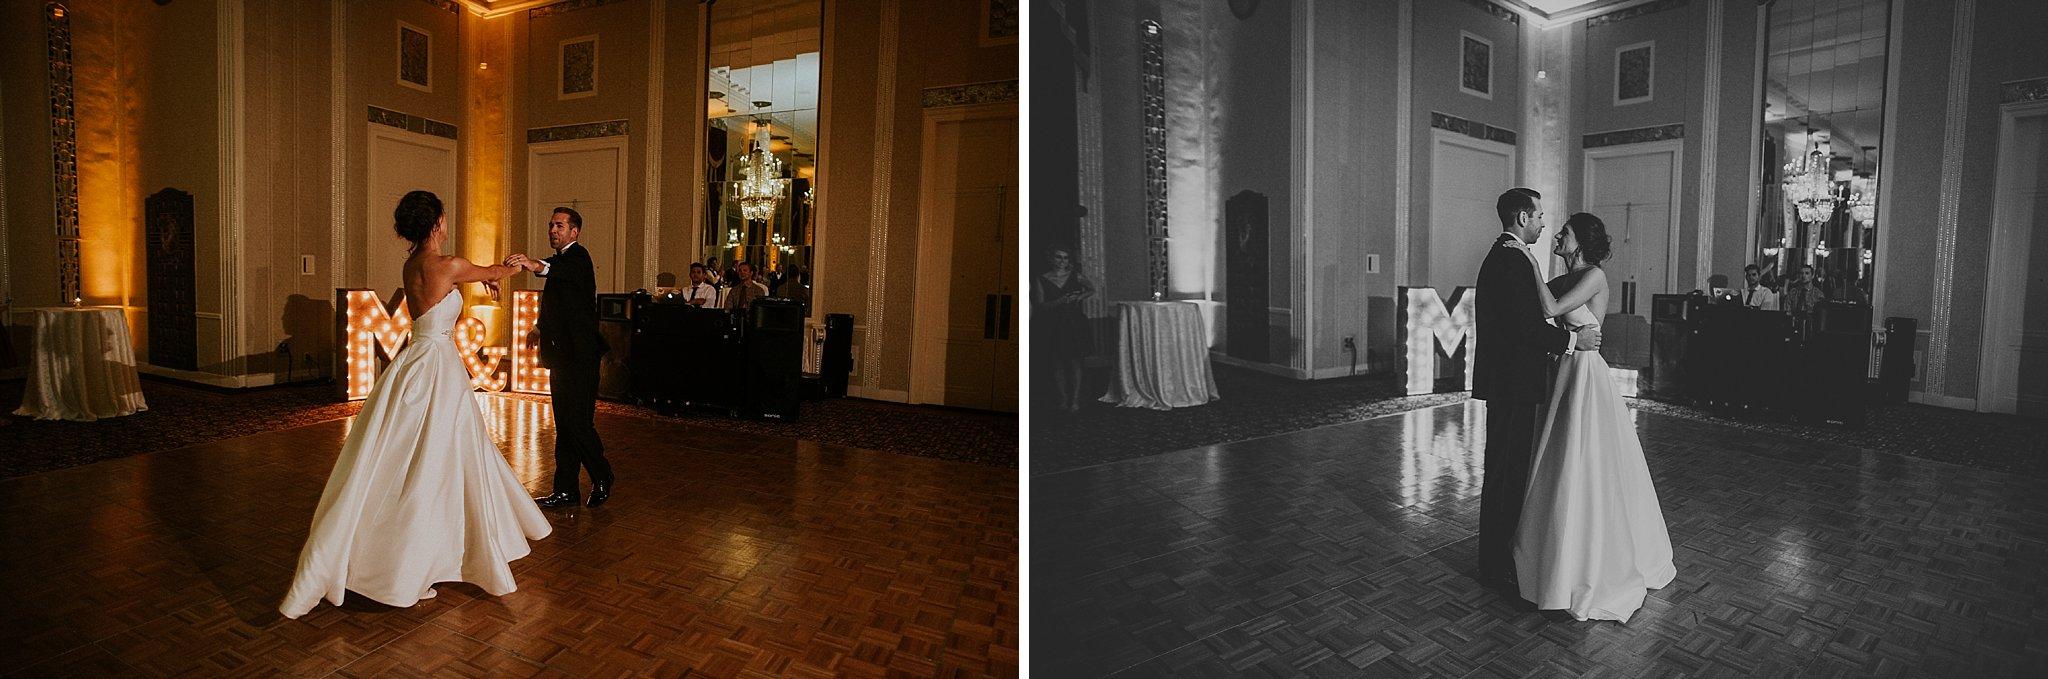 Matt-Lauren_St-Marys_Hilton-City-Center-Milwaukee-Wedding_liller-photo_0085.jpg